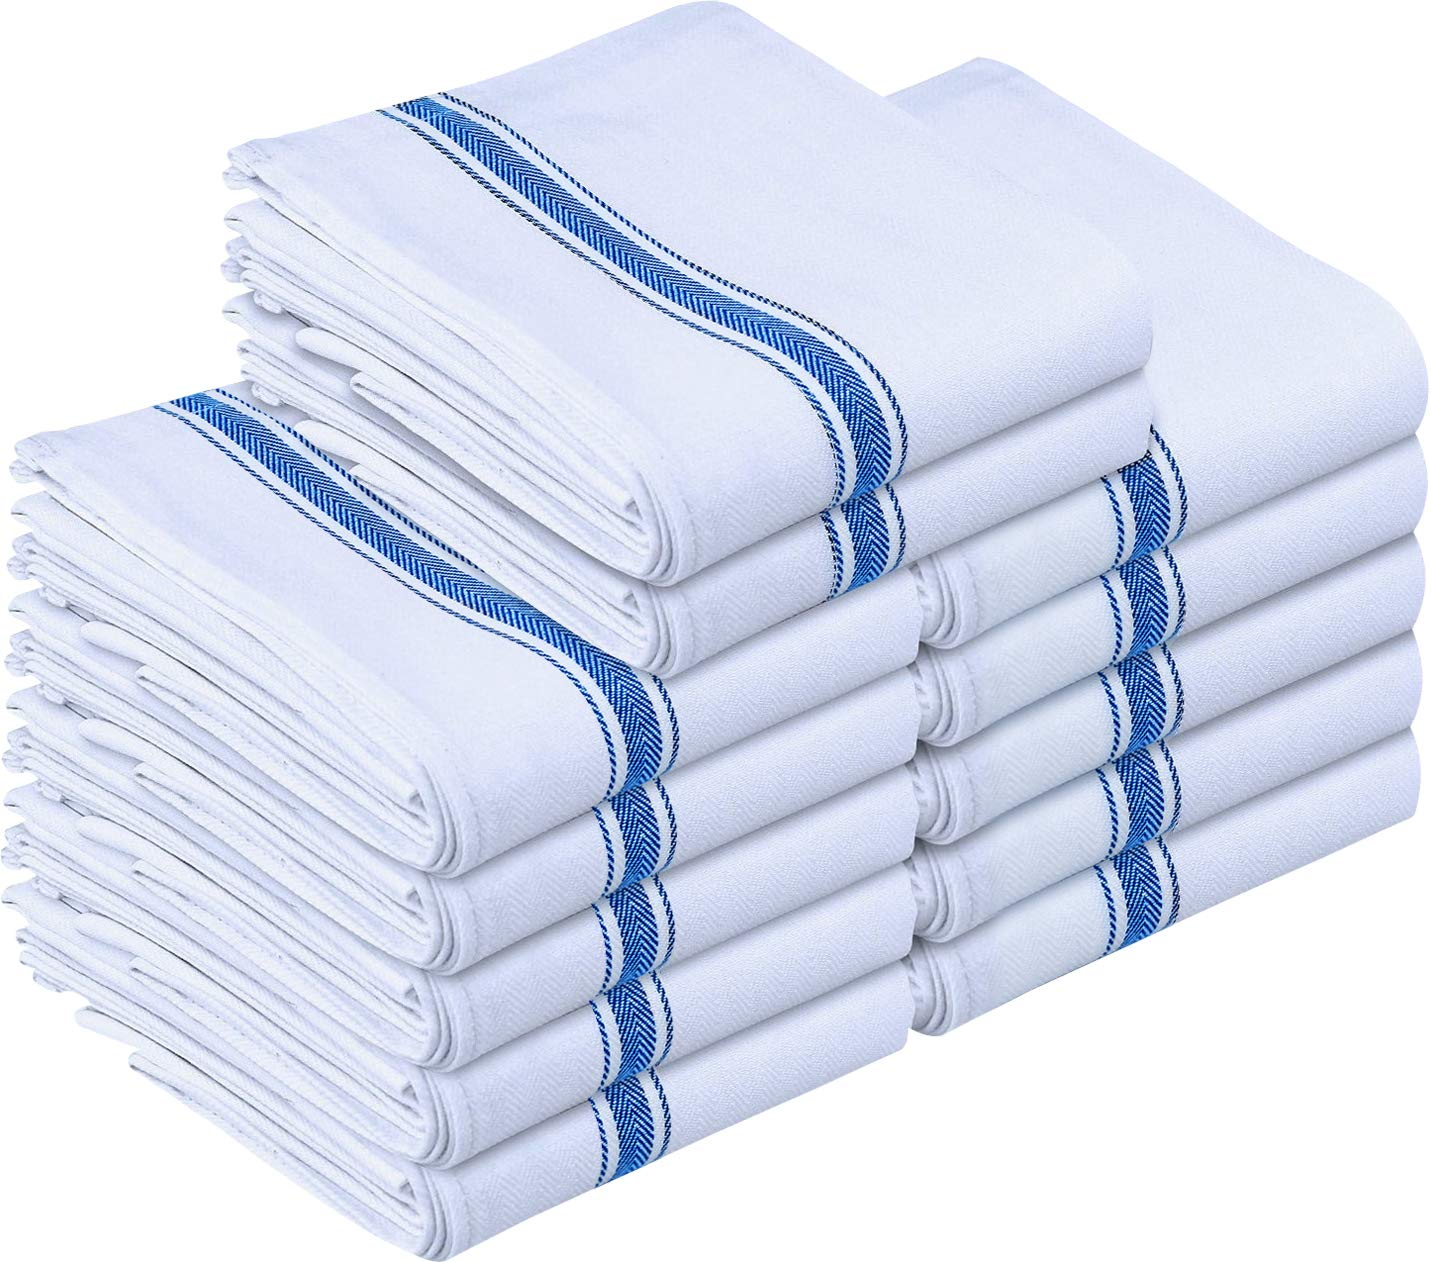 Utopia Towels Kitchen Towels - Dish Cloth (12 Pack) - Machine Washable Cotton White Kitchen Dishcloths, Dish Towel & Tea Towels (15 x 25 Inch) (Blue) UT0219